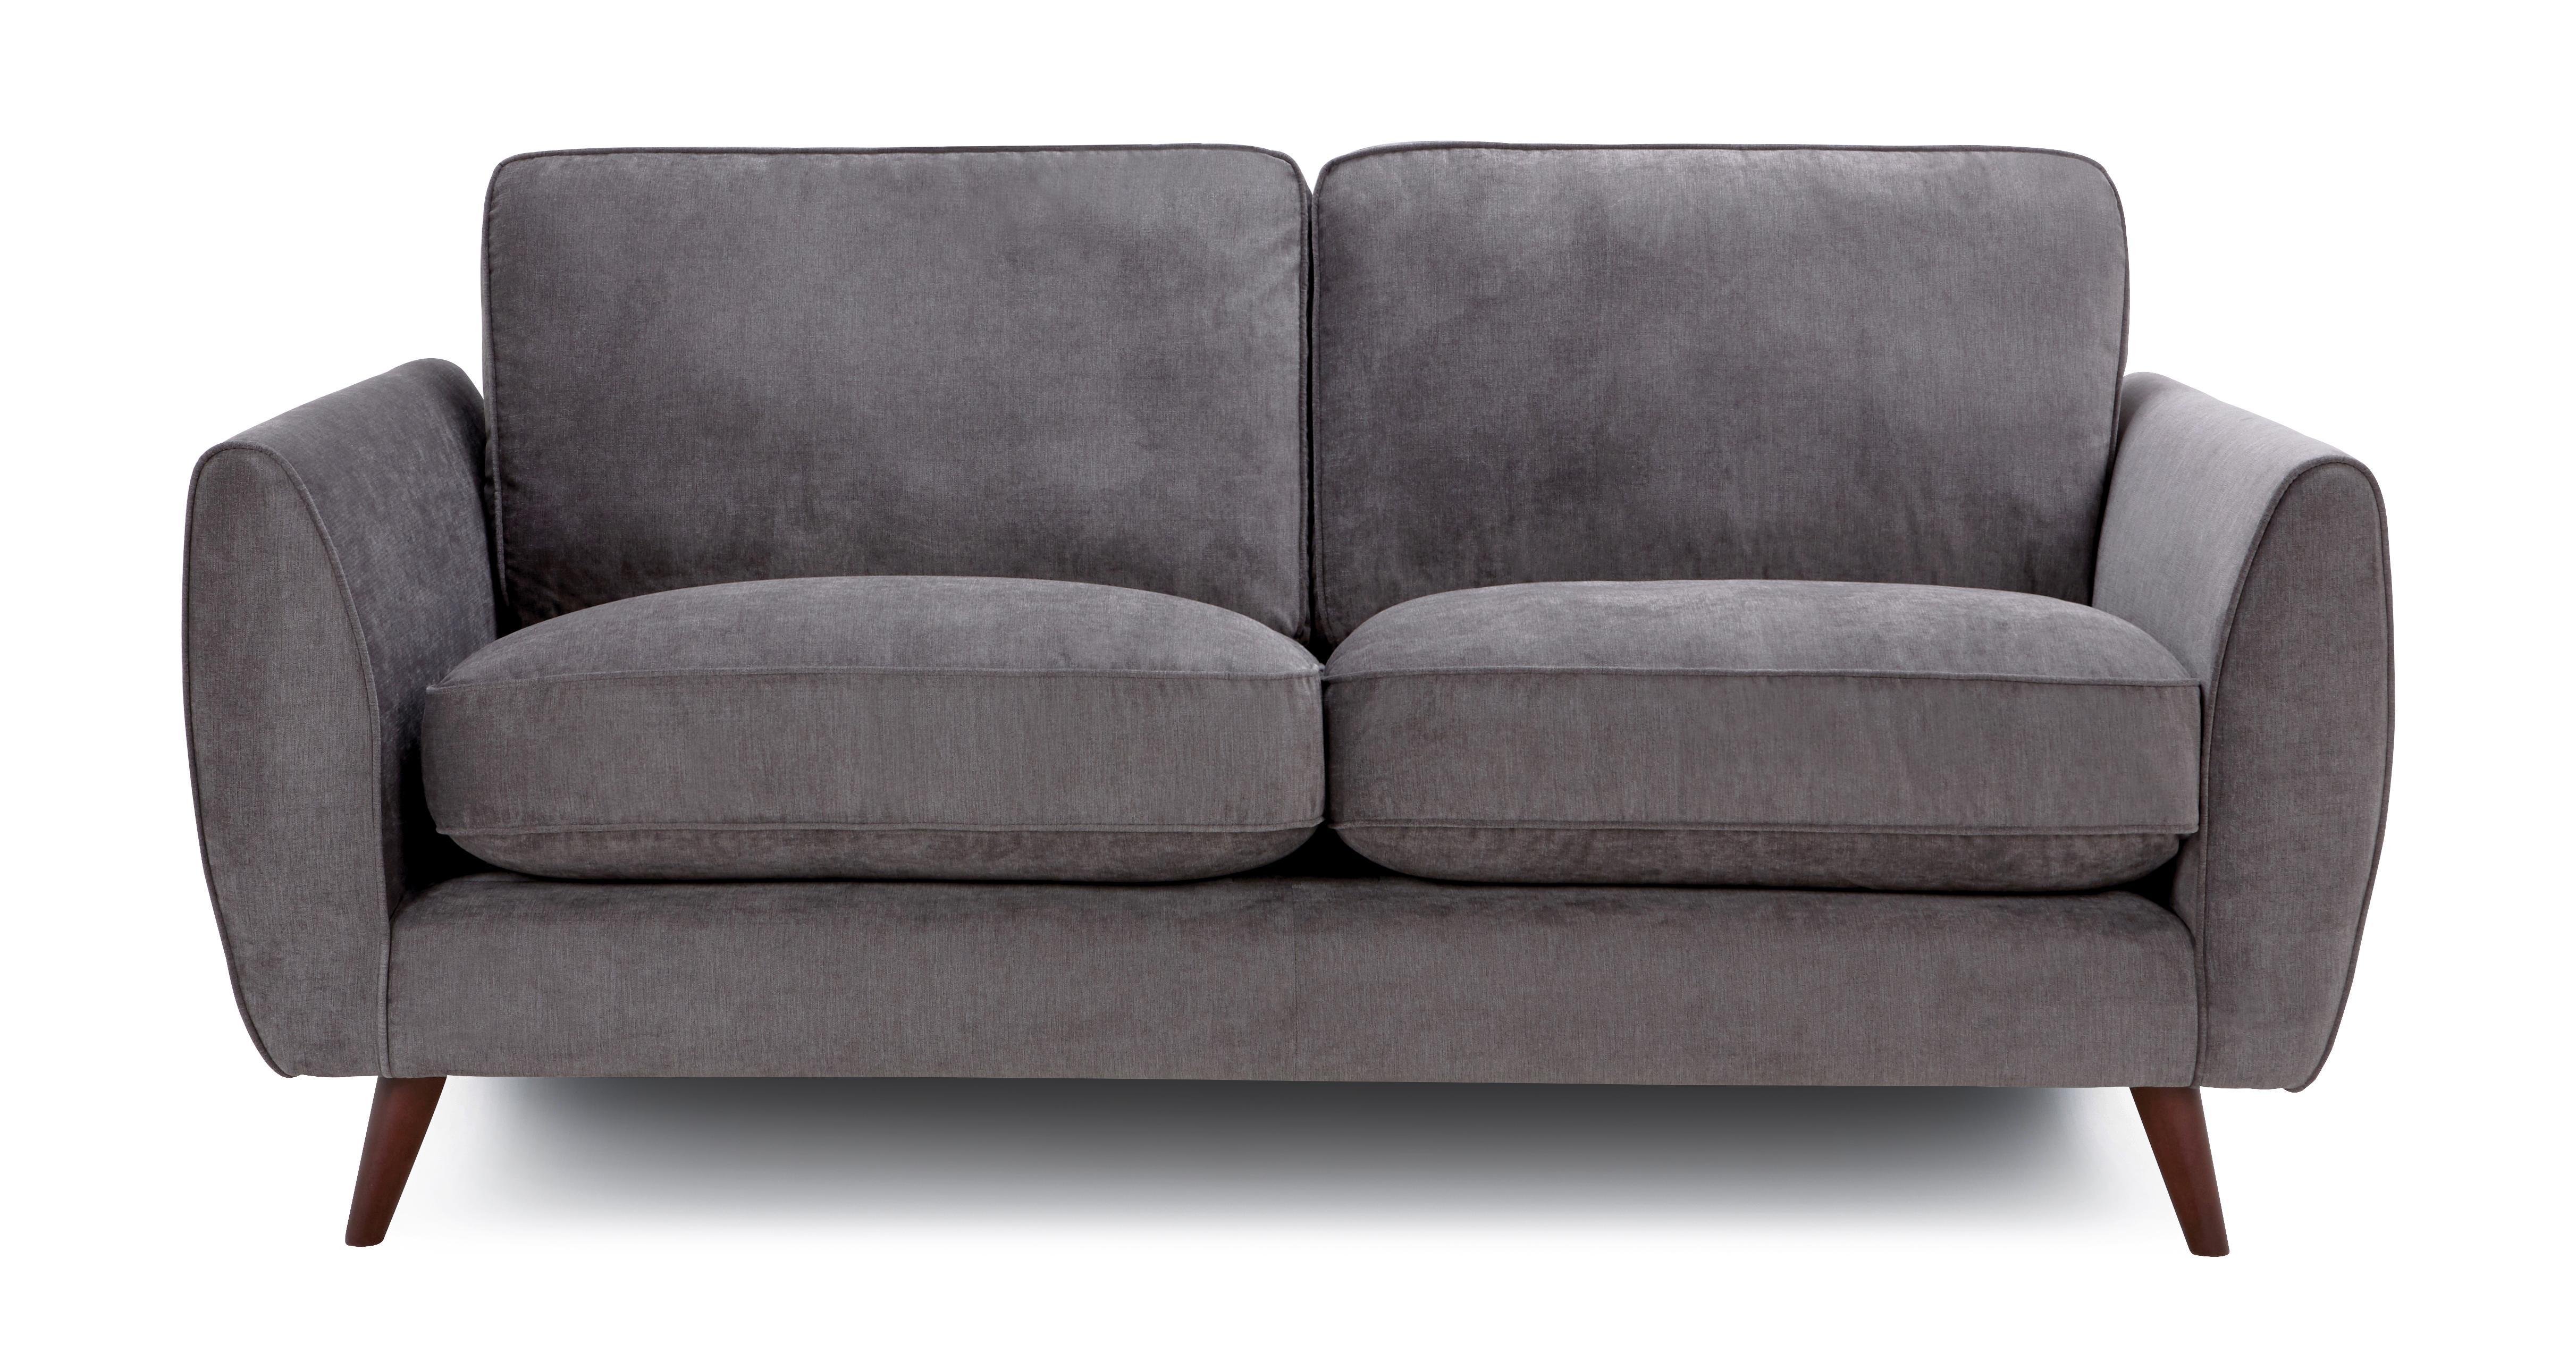 navy blue sofa bed uk clean microfiber upholstery sofas brokeasshome